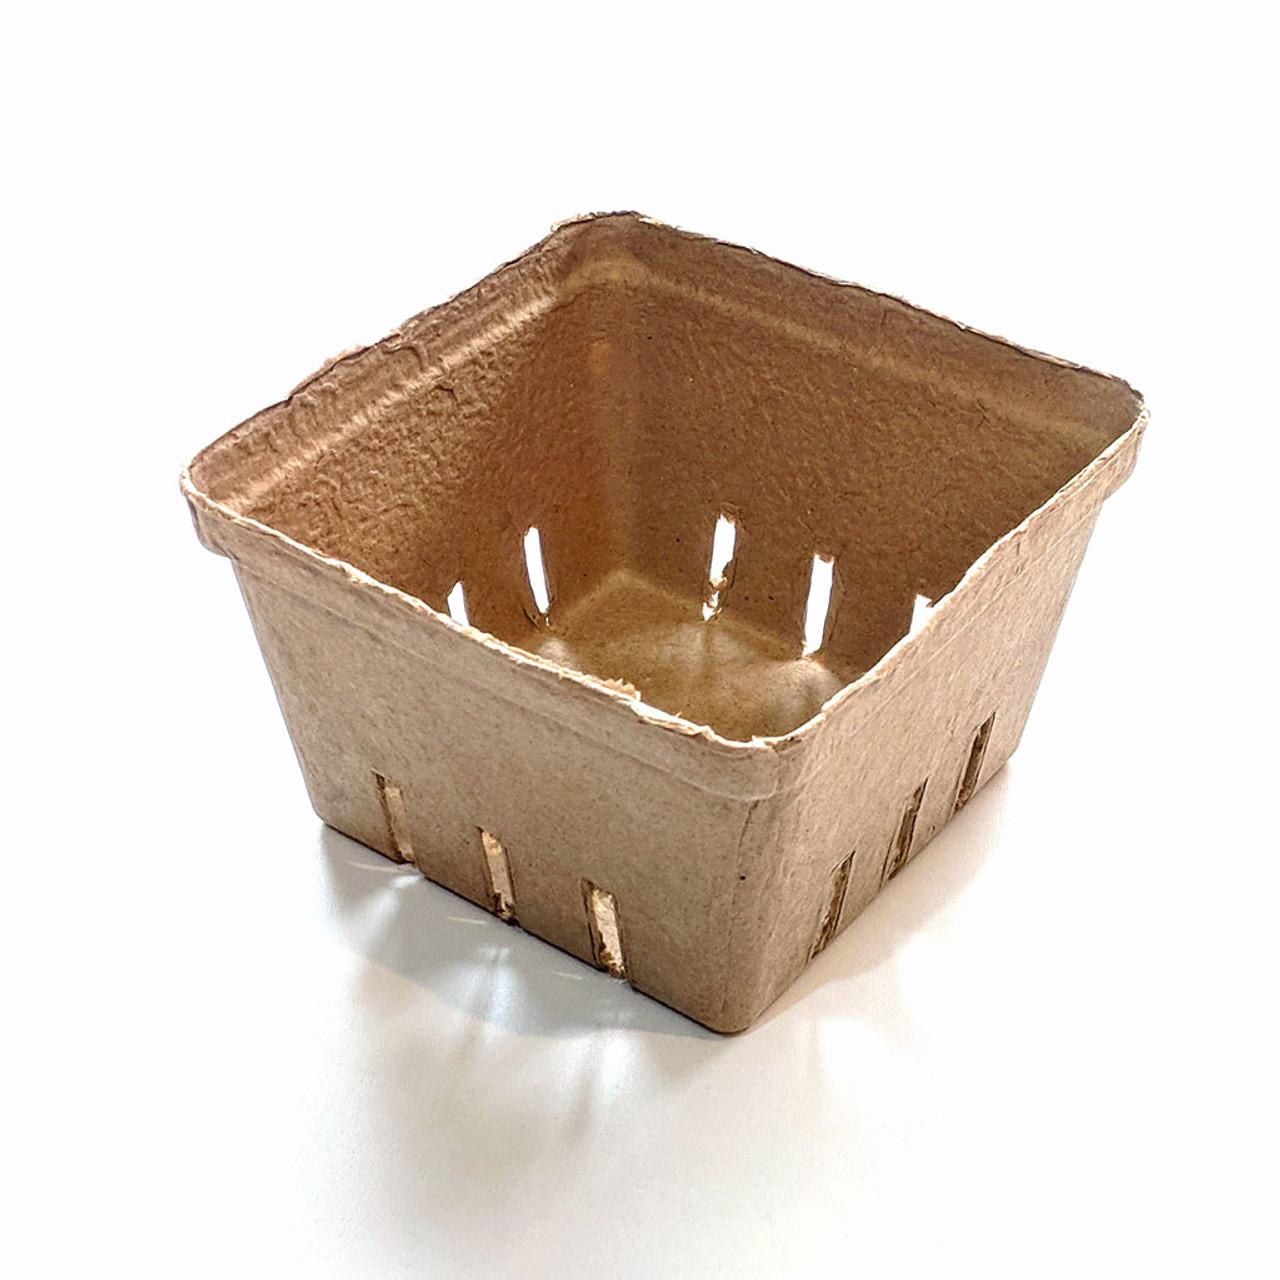 1 Quart Paper Molded Berry / Produce Basket